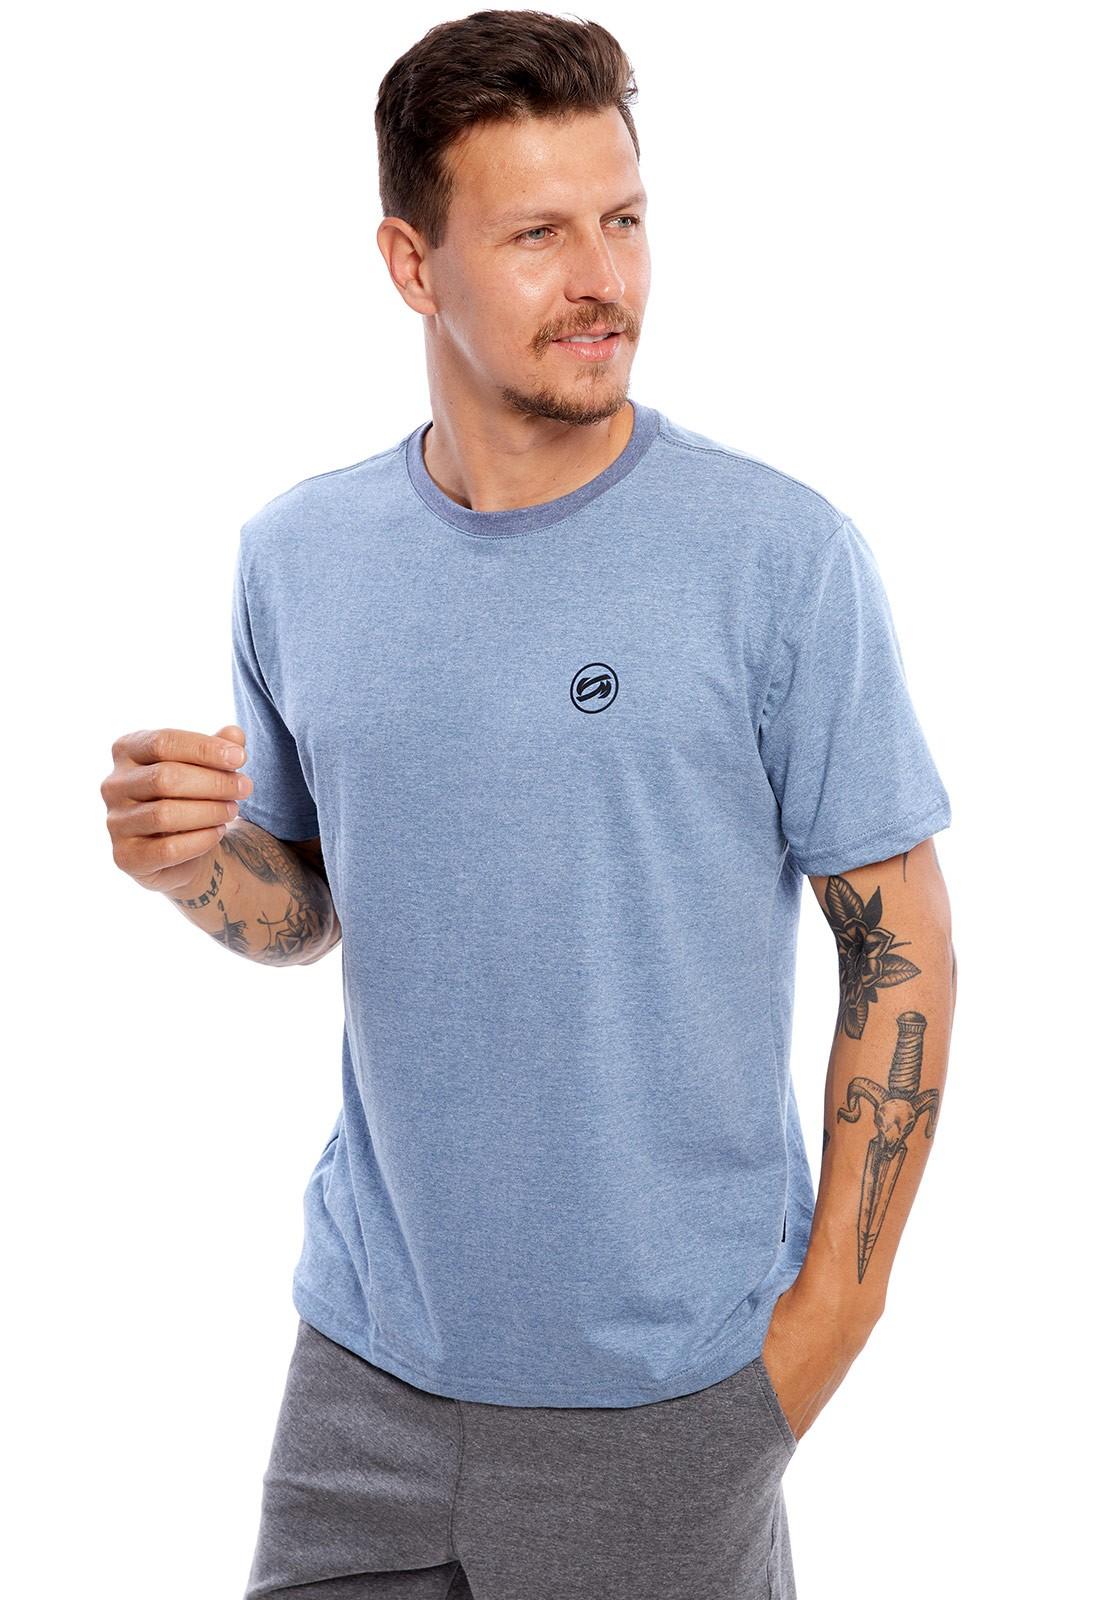 Camiseta Vida Marinha Manga Curta Bege